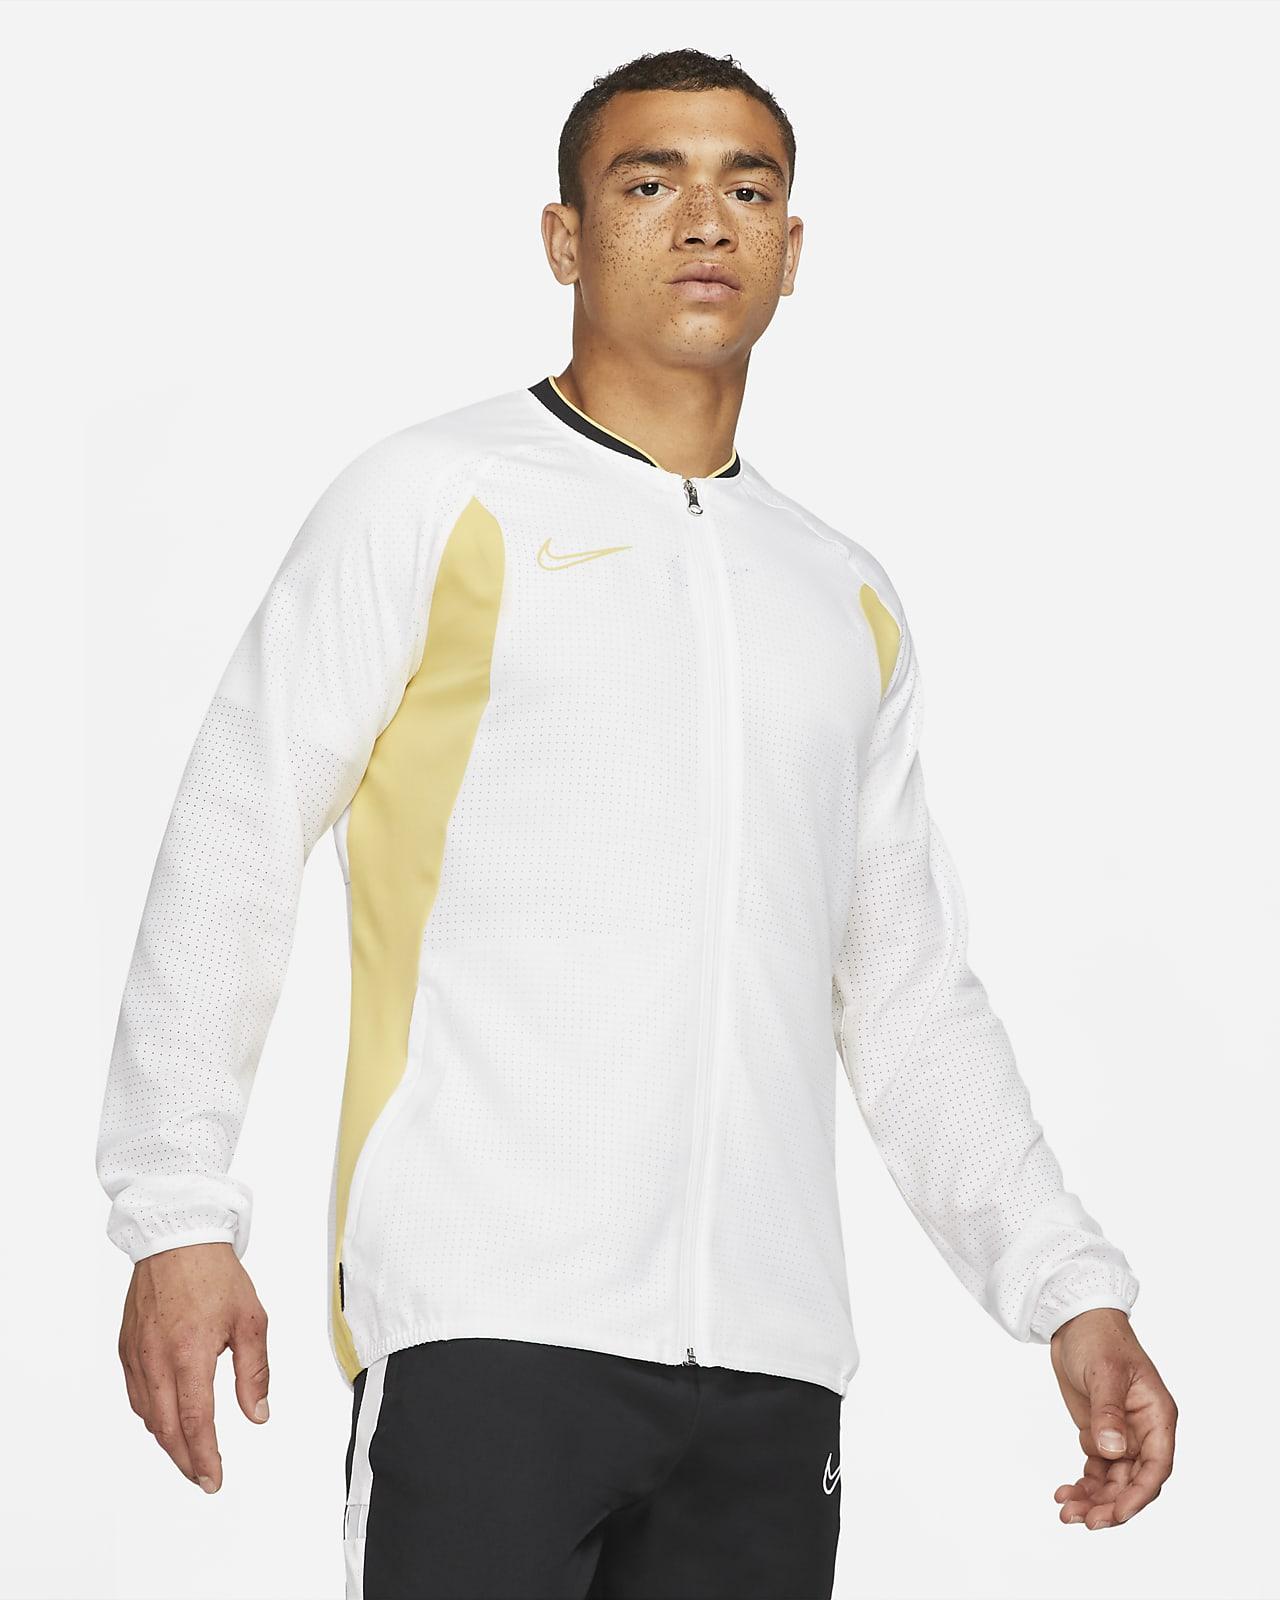 Nike Dri-FIT Academy AWF Men's Football Jacket